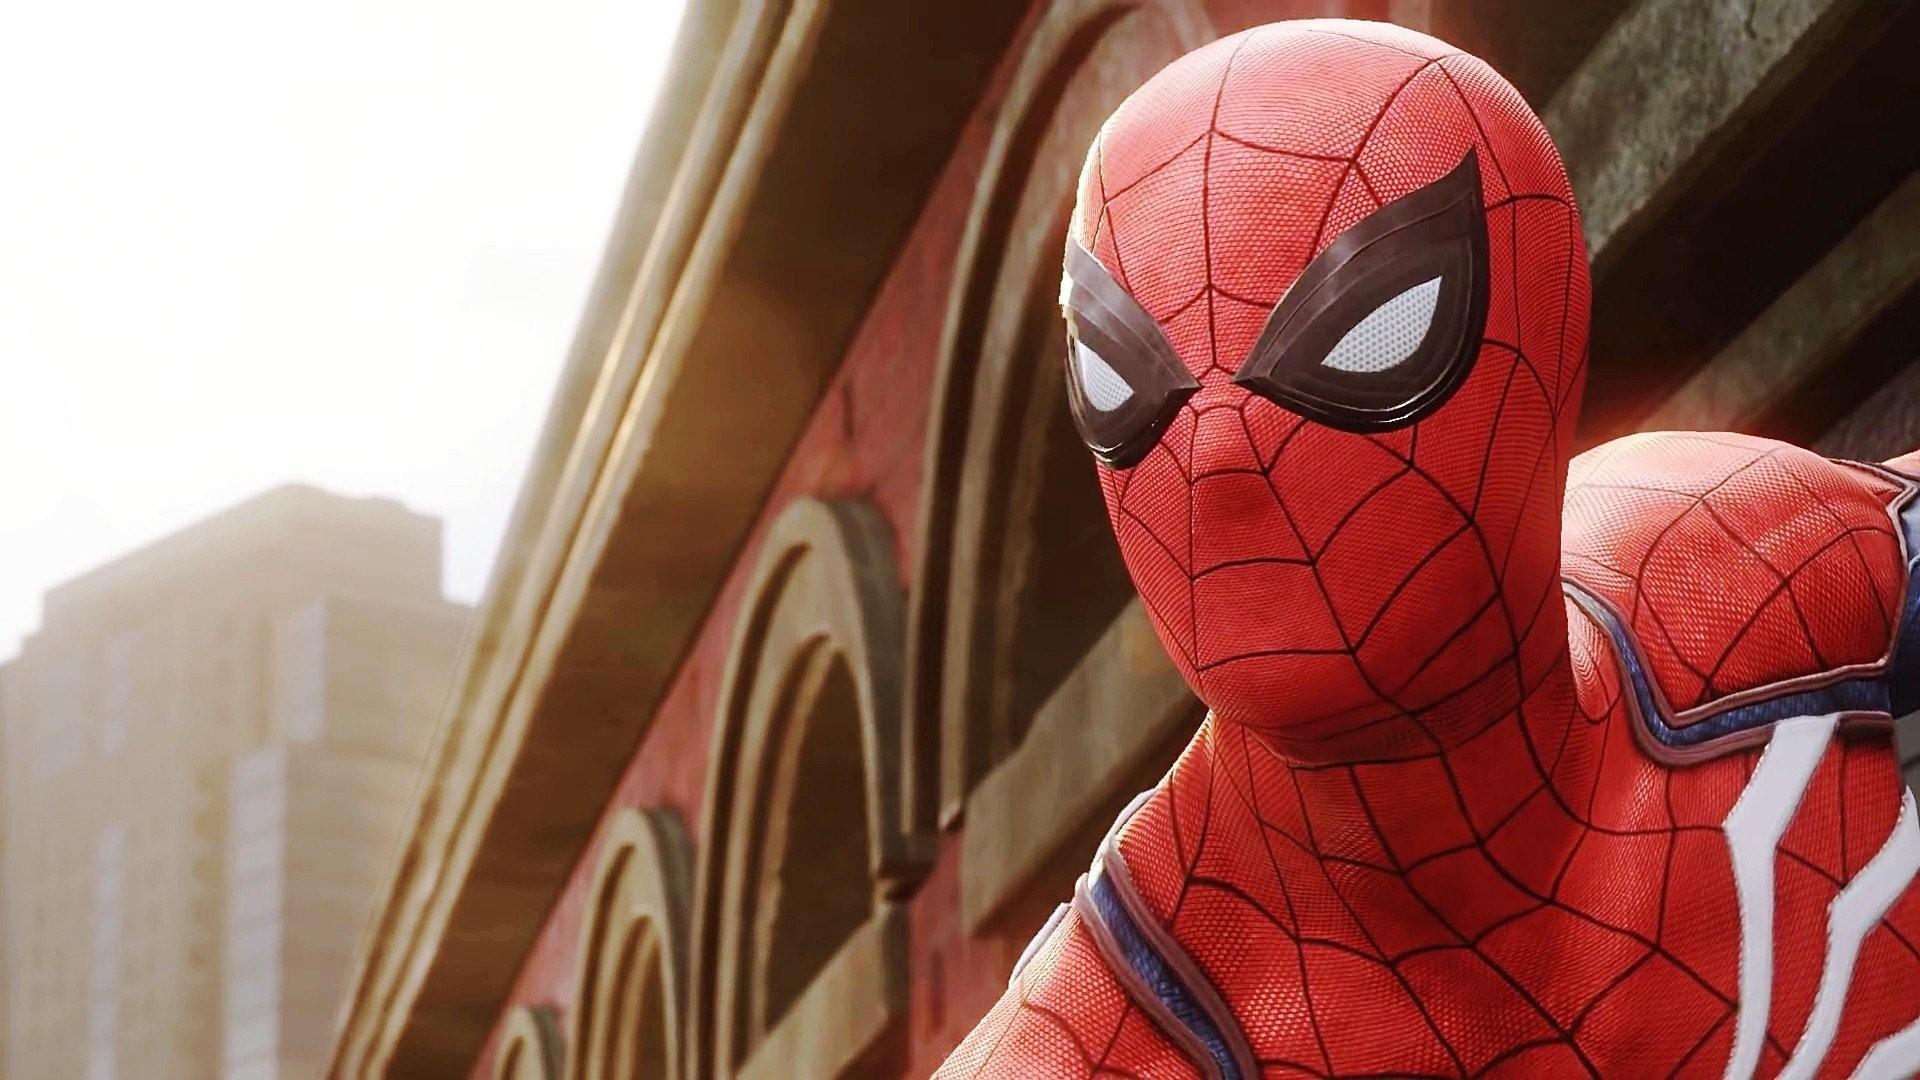 spiderman 2018 wallpaper (75+ images)